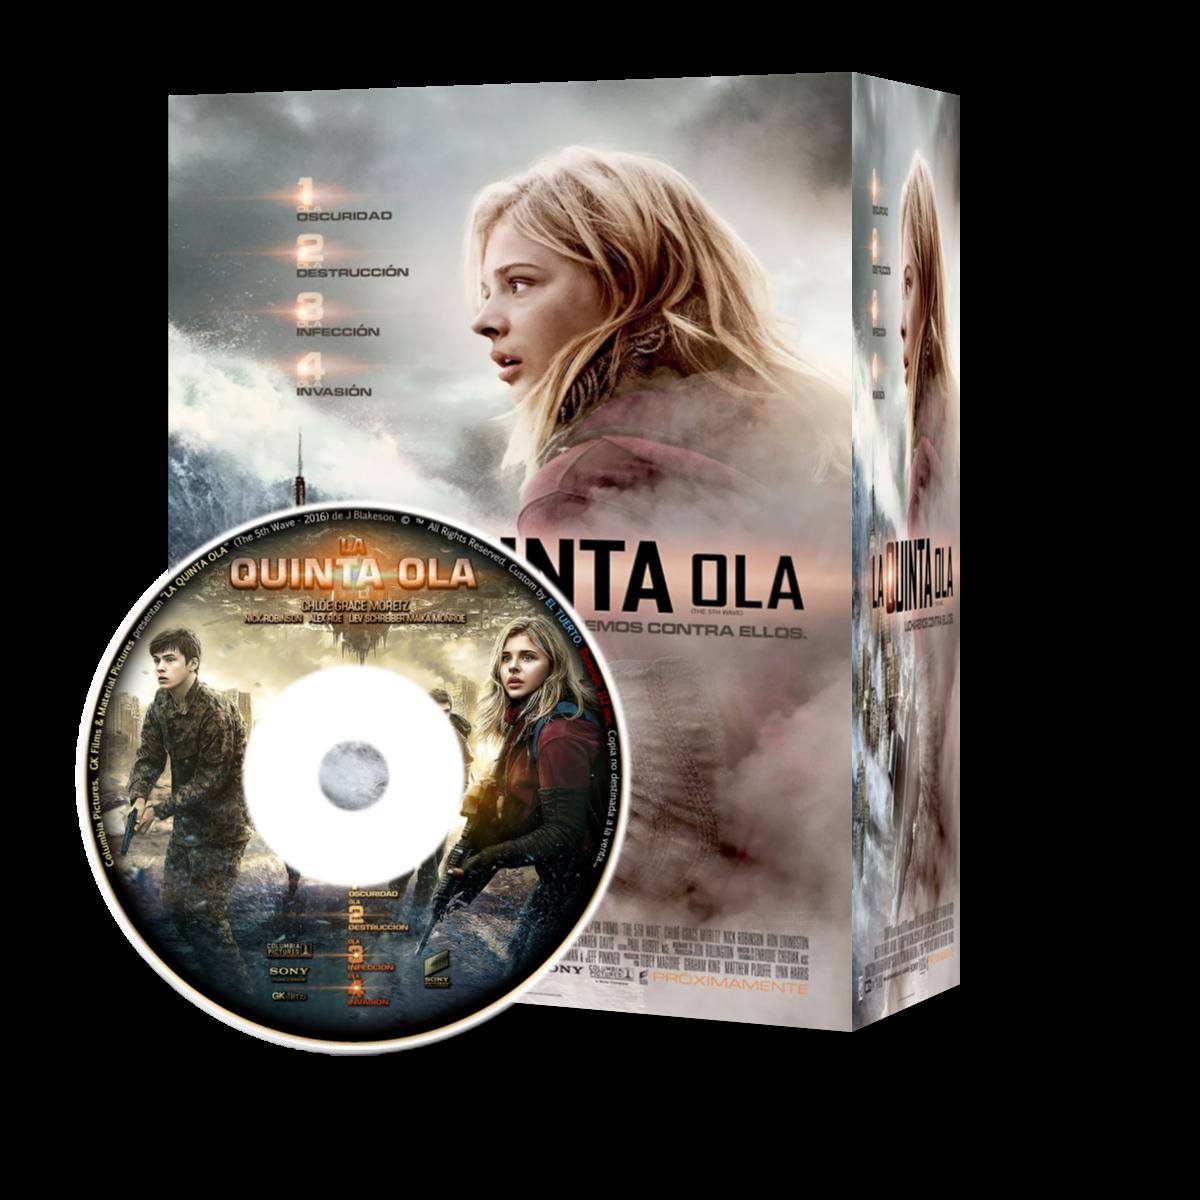 La Quinta Ola | The 5th Wave 2016